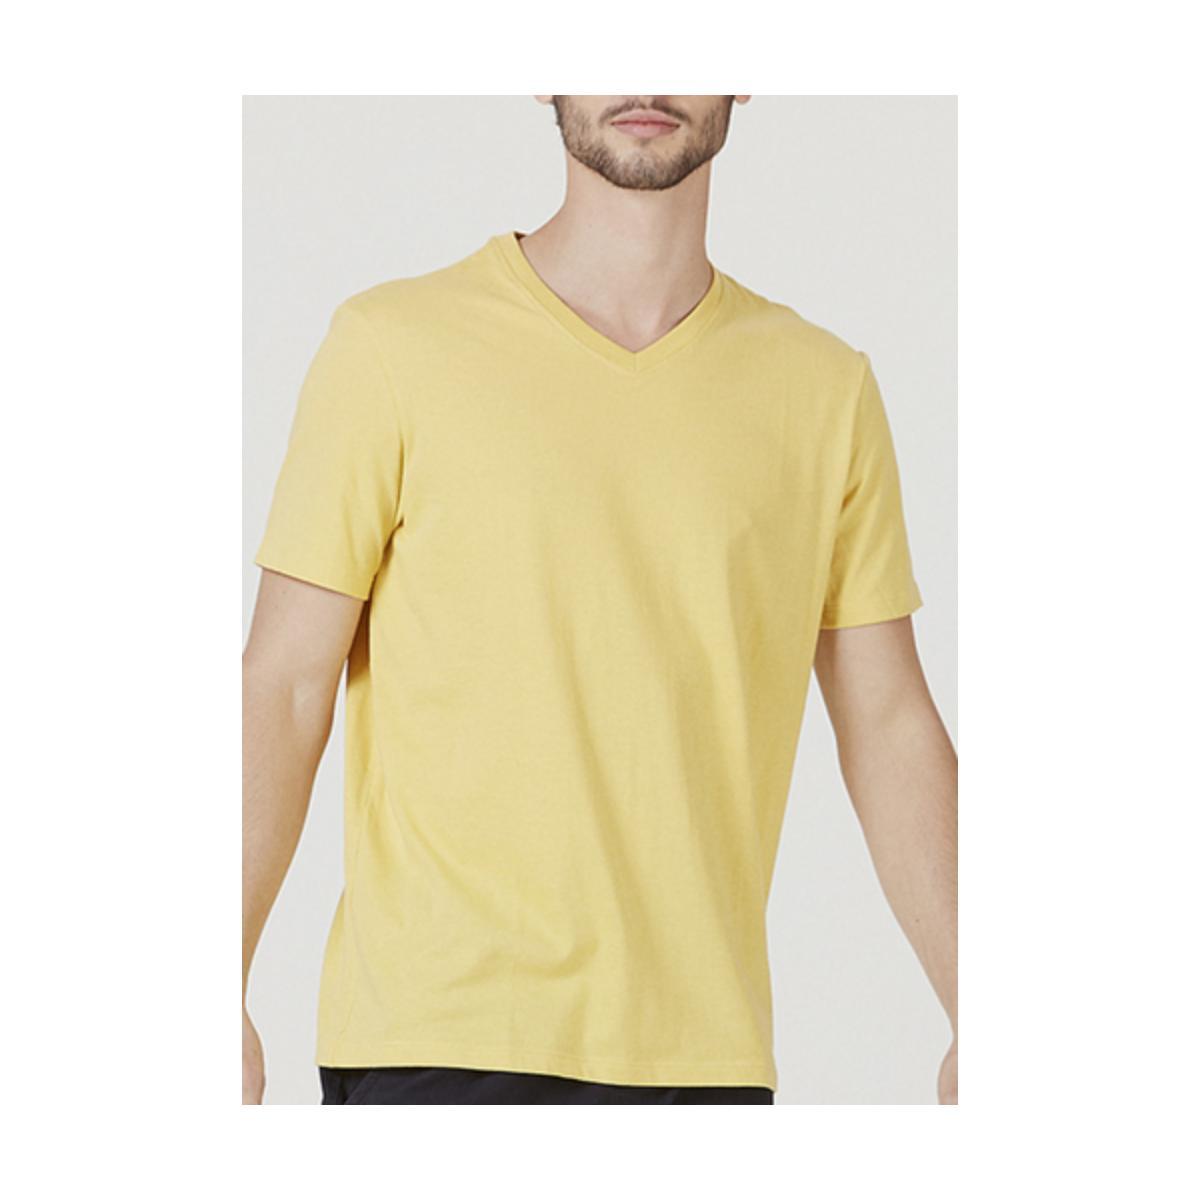 Camiseta Masculina Hering 022b Ynjen Amarelo Claro